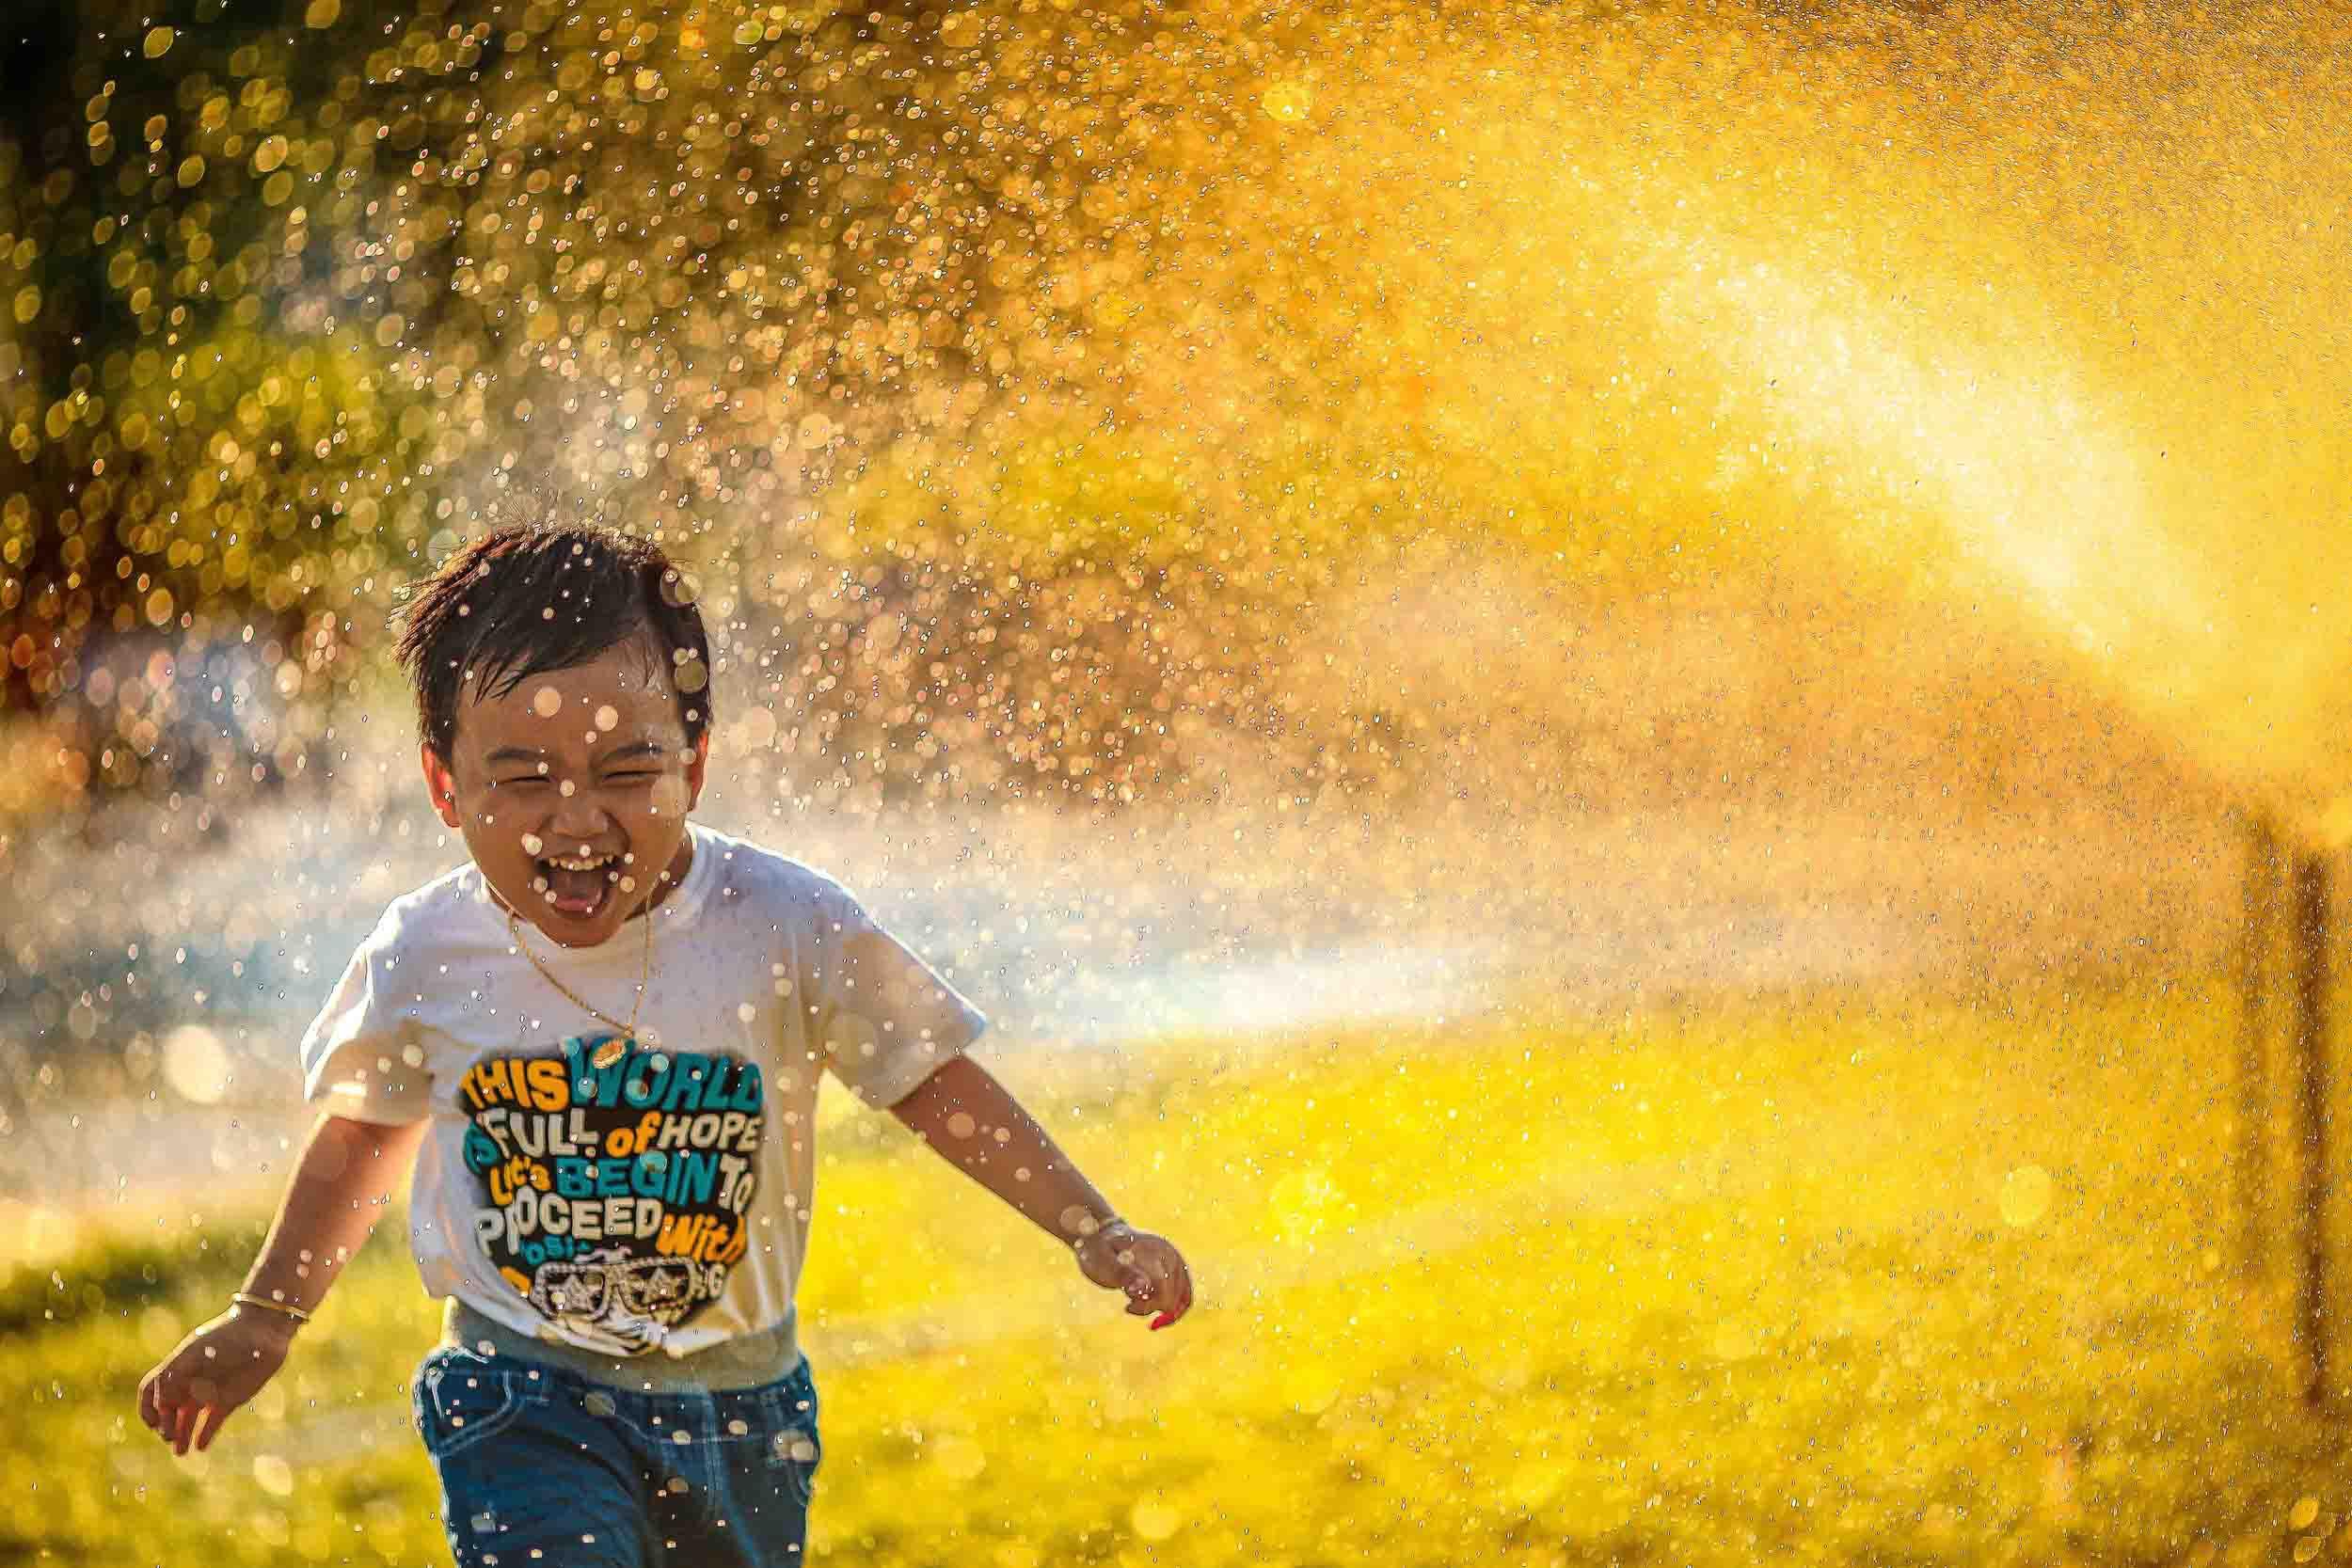 Asian-child-image-asset-2.jpg